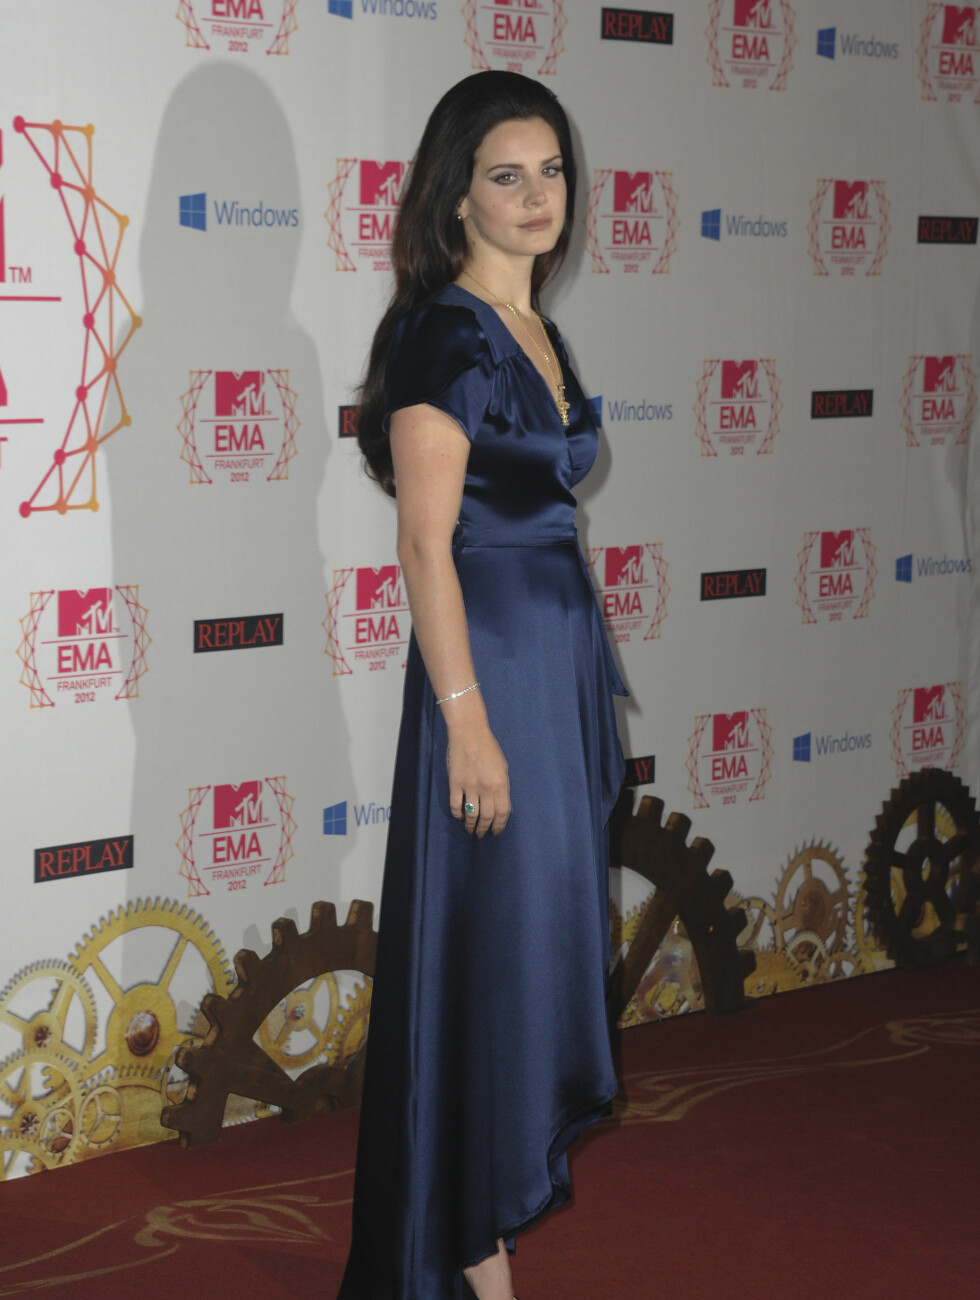 KONSERVATIV: Lana Del Rey slaktes for sin enkle satengkjole.  Foto: Fame Flynet